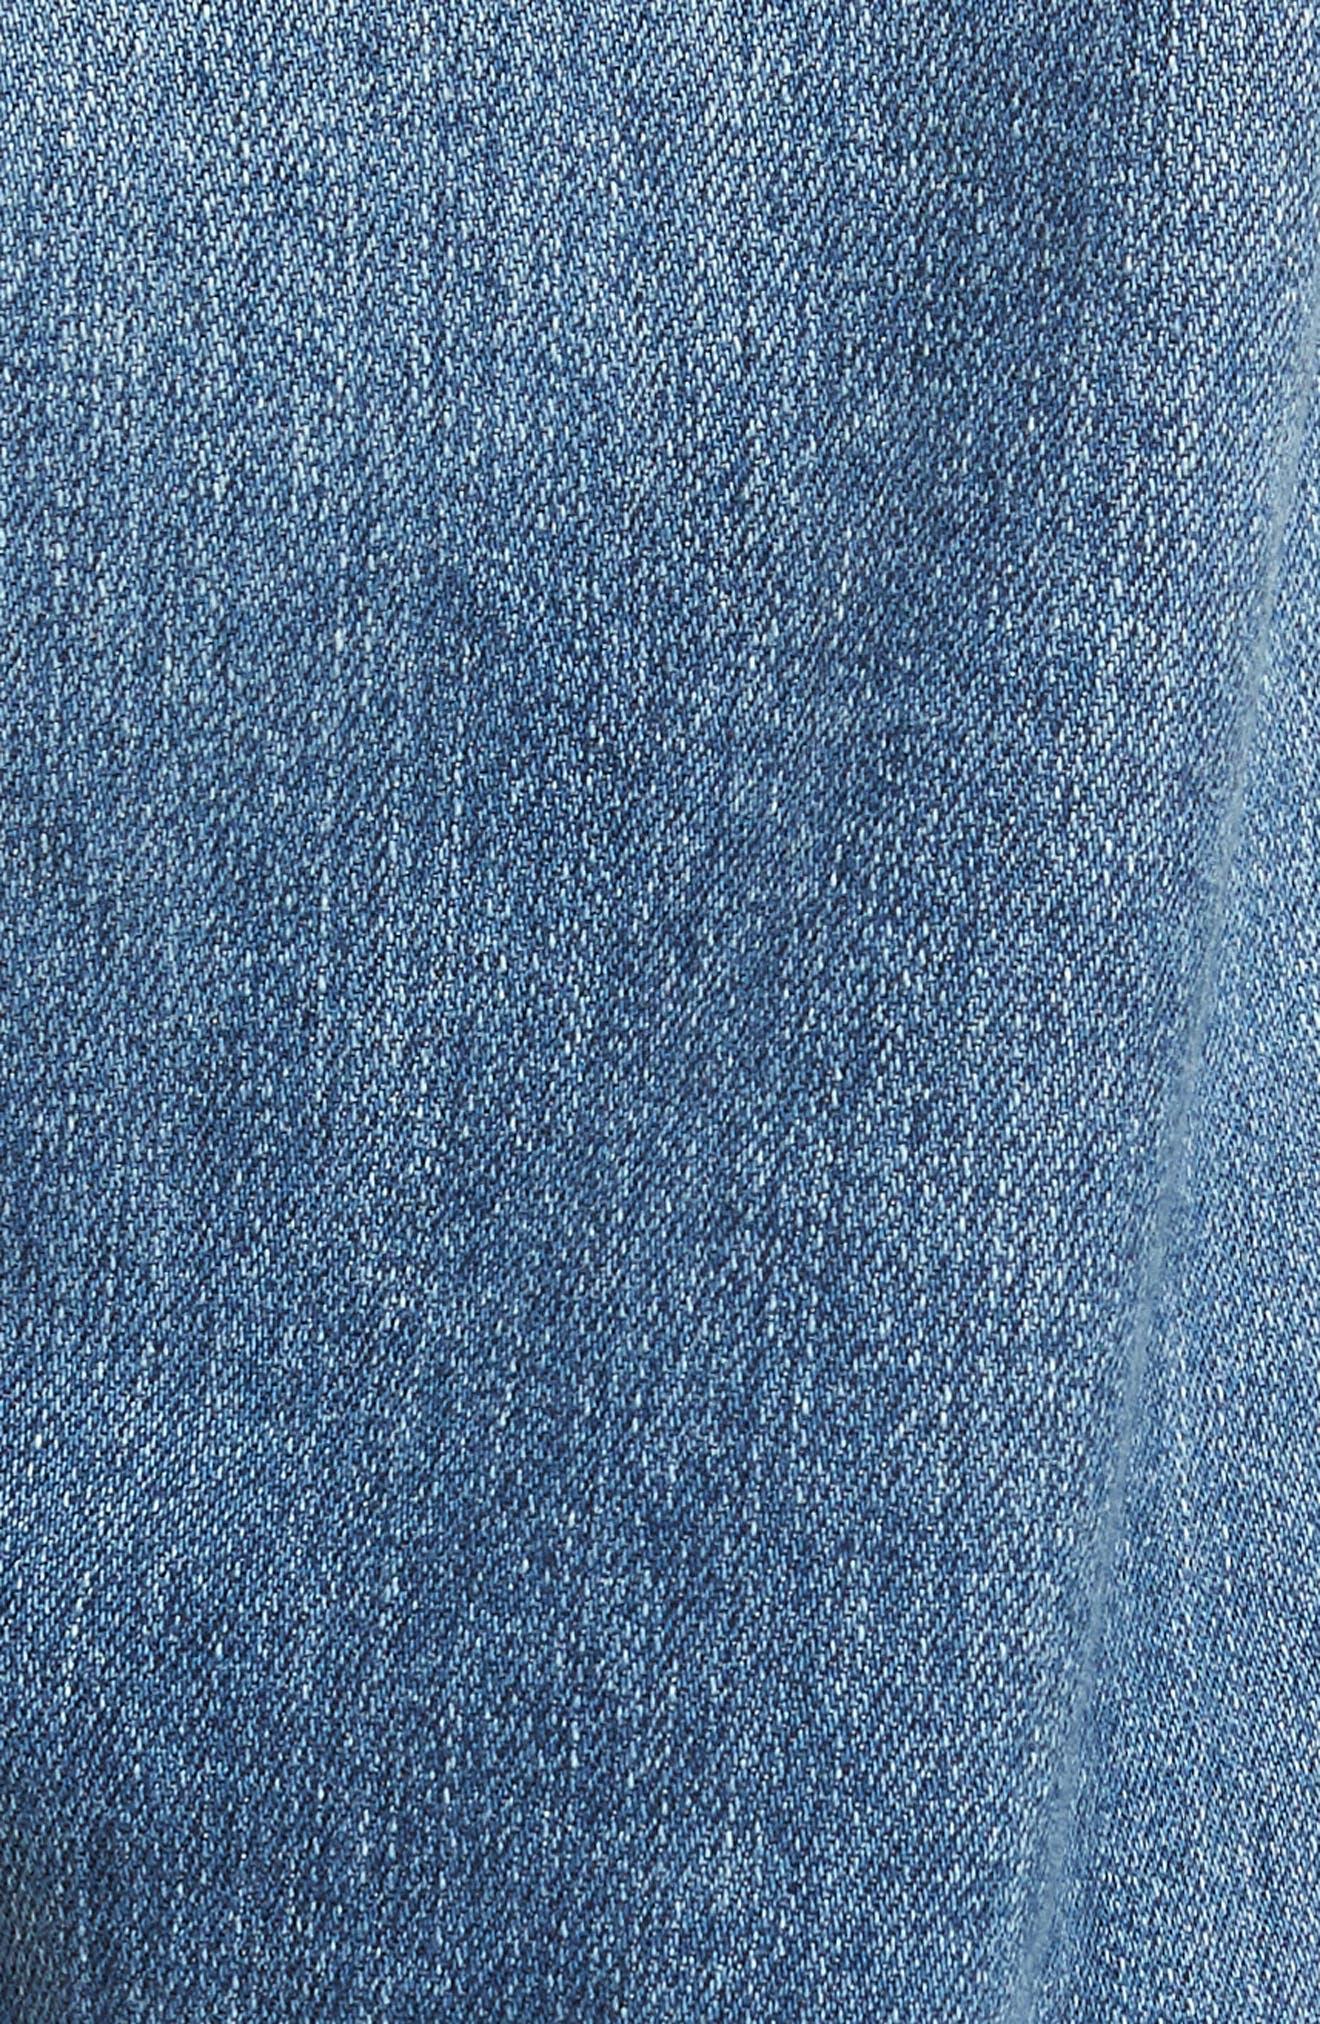 Ives Straight Leg Jeans,                             Alternate thumbnail 5, color,